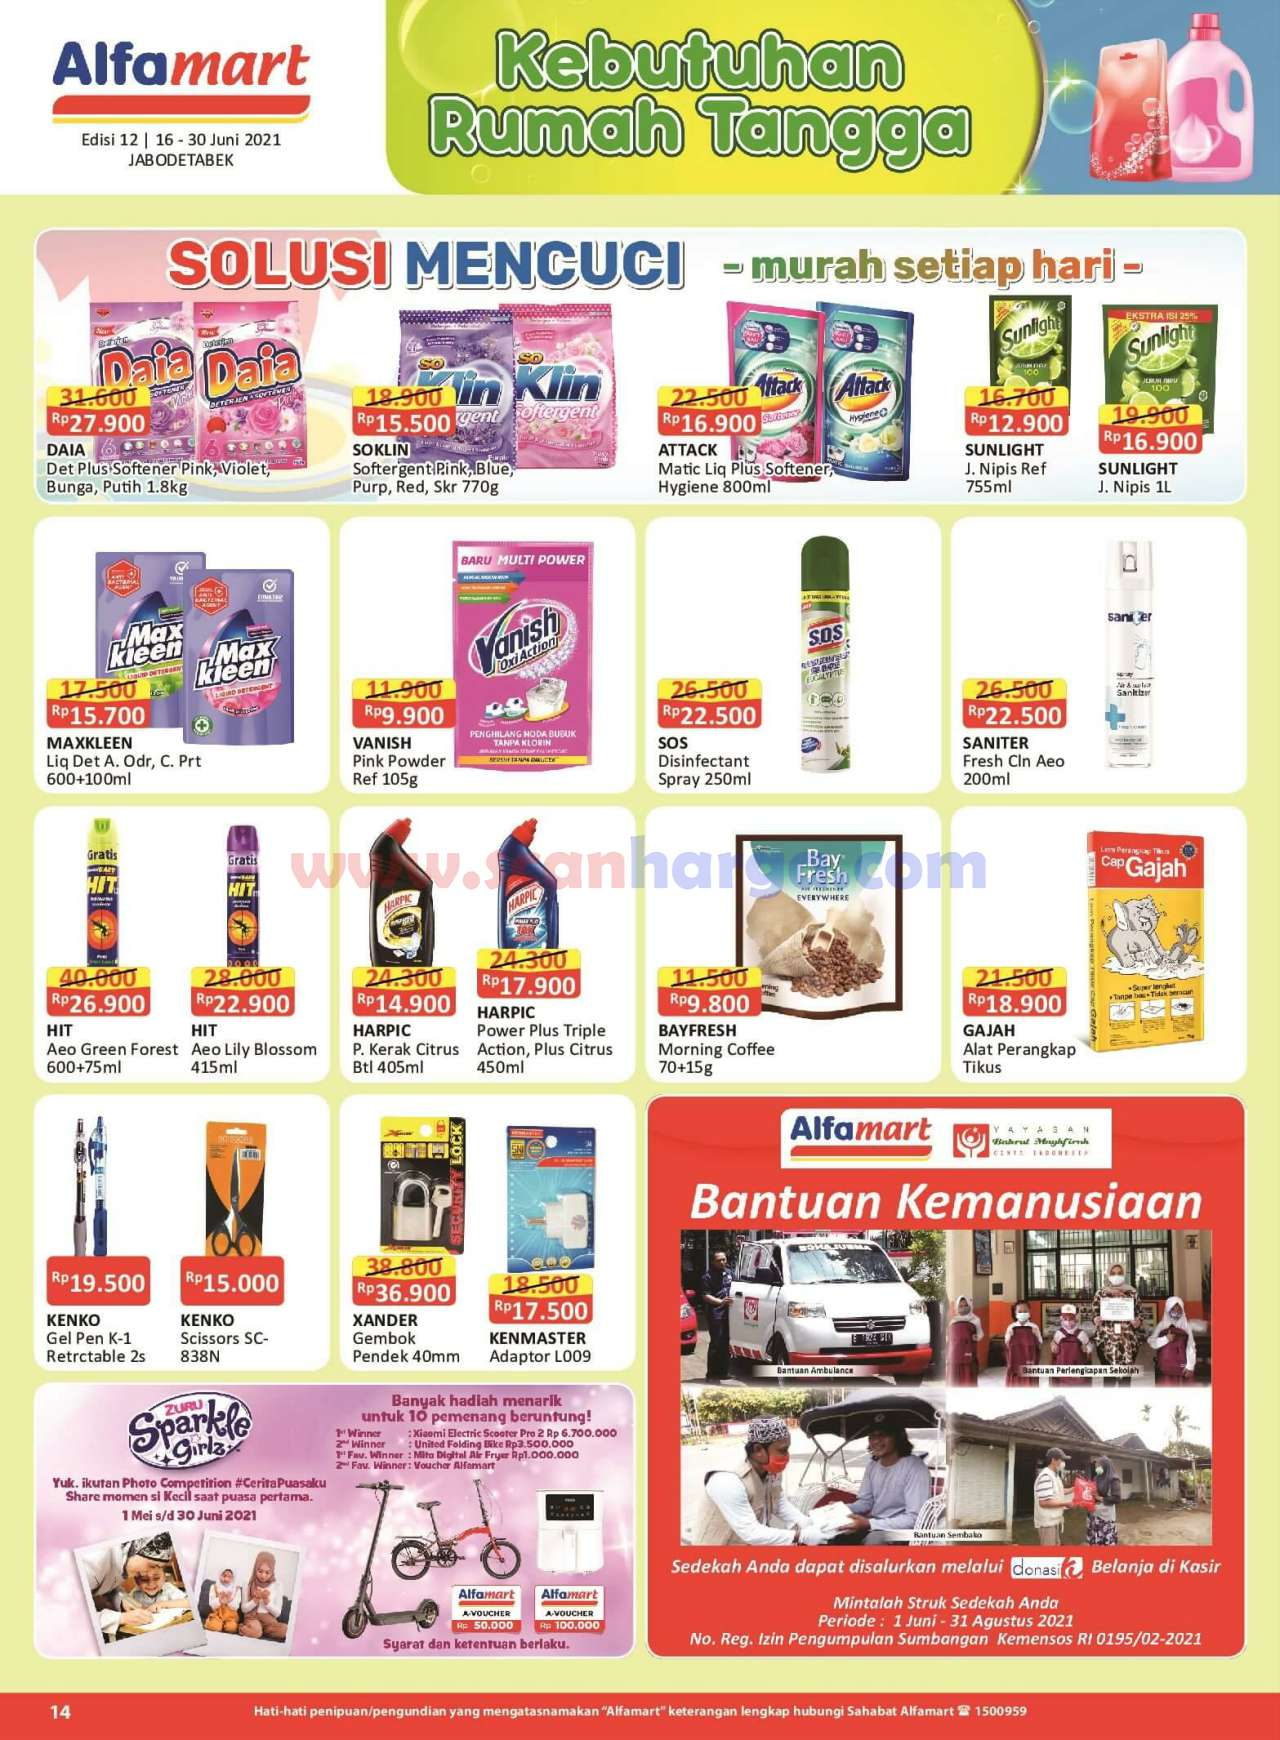 Katalog Promo Alfamart 16 - 30 Juni 2021 14